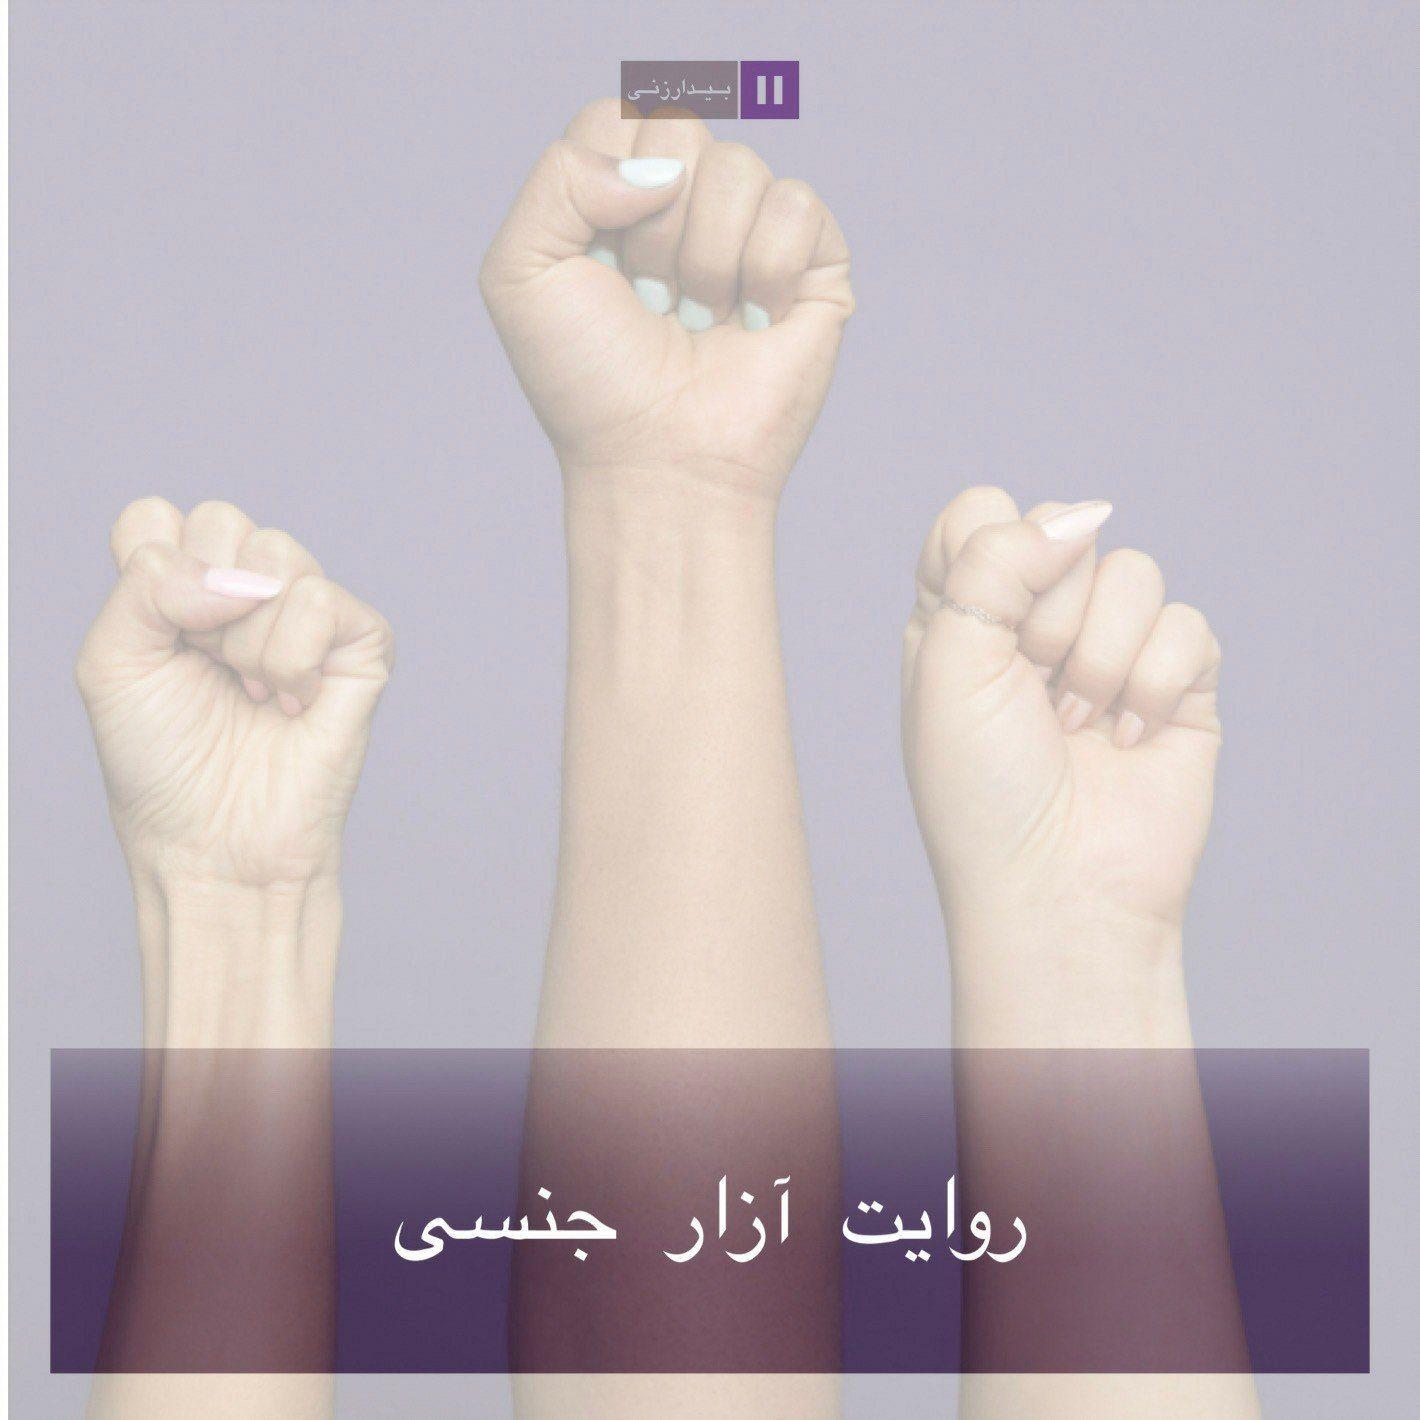 فراخوان گفتگو پیرامون روایتگری خشونت جنسی و مسئولیت اجتماعی ما